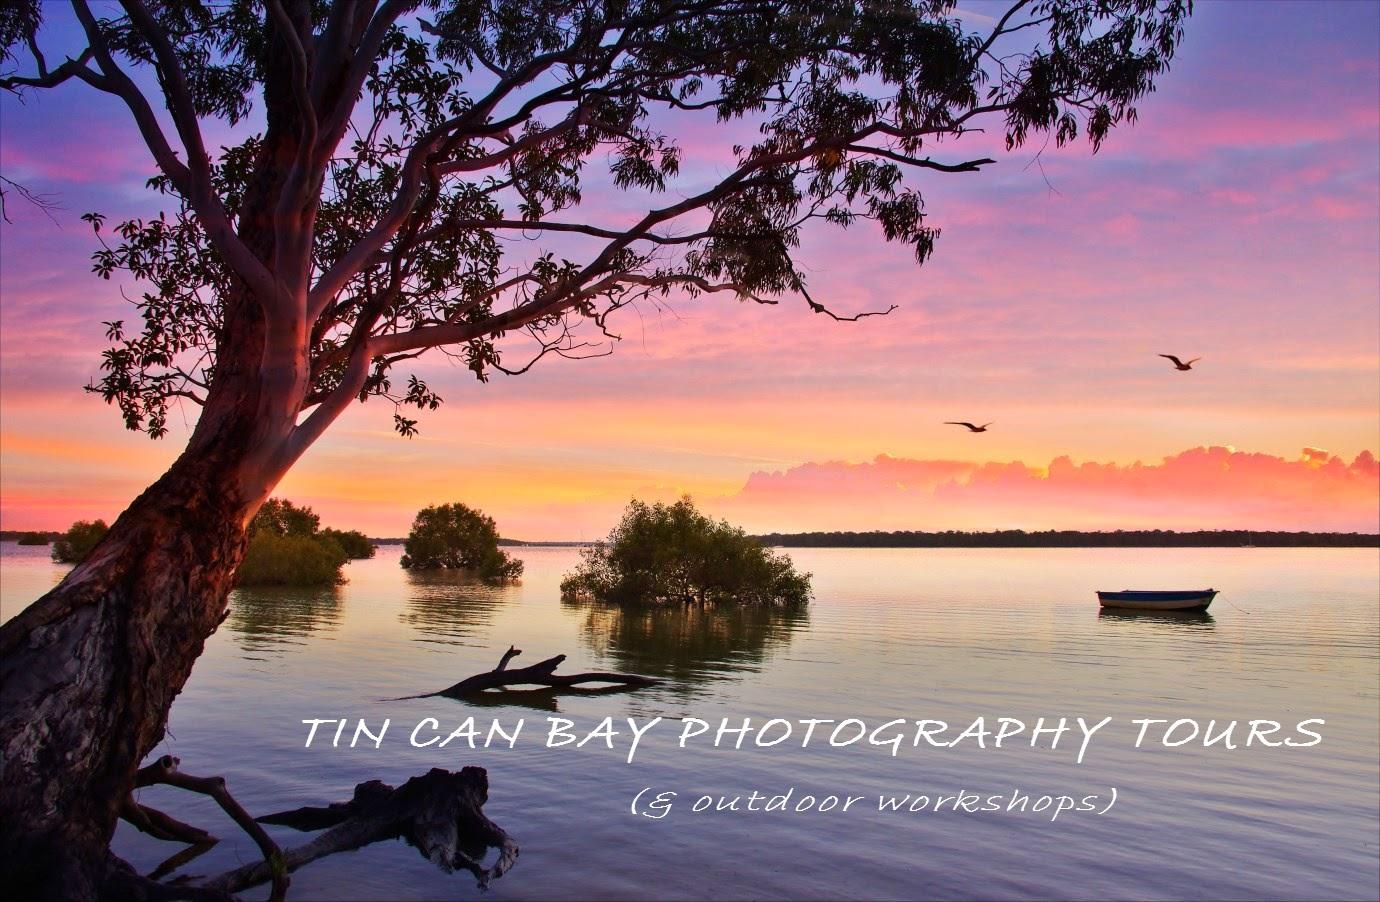 Tin Can Bay Photography Tours